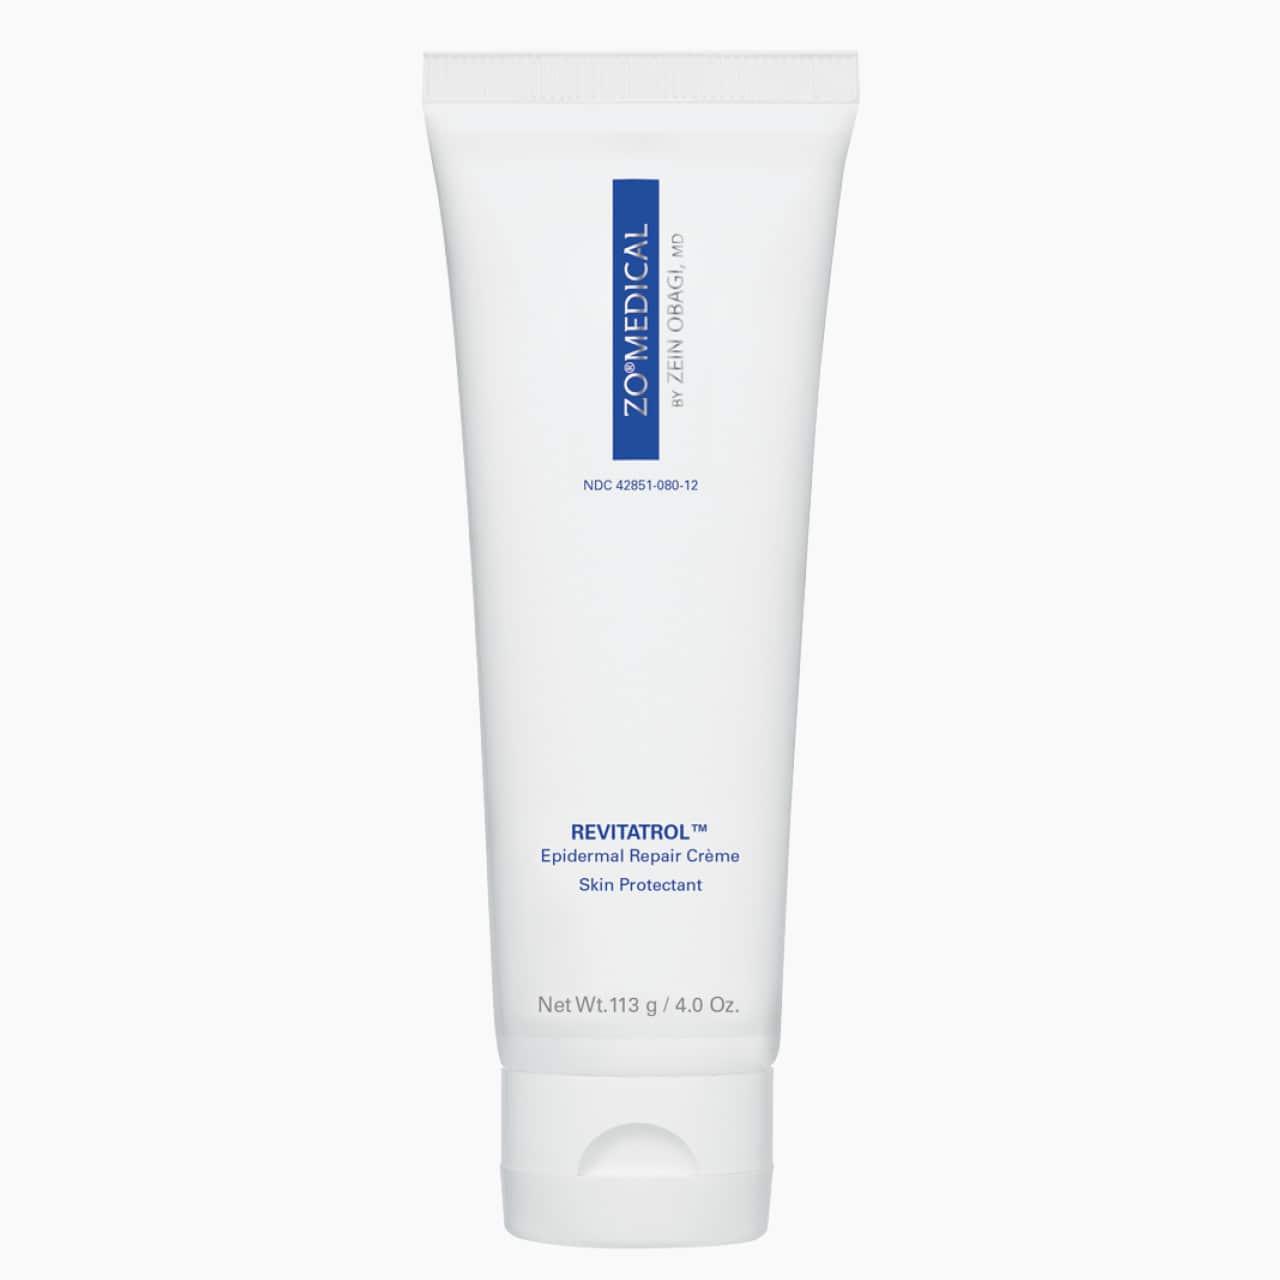 ZO Skin Health Revitatrol